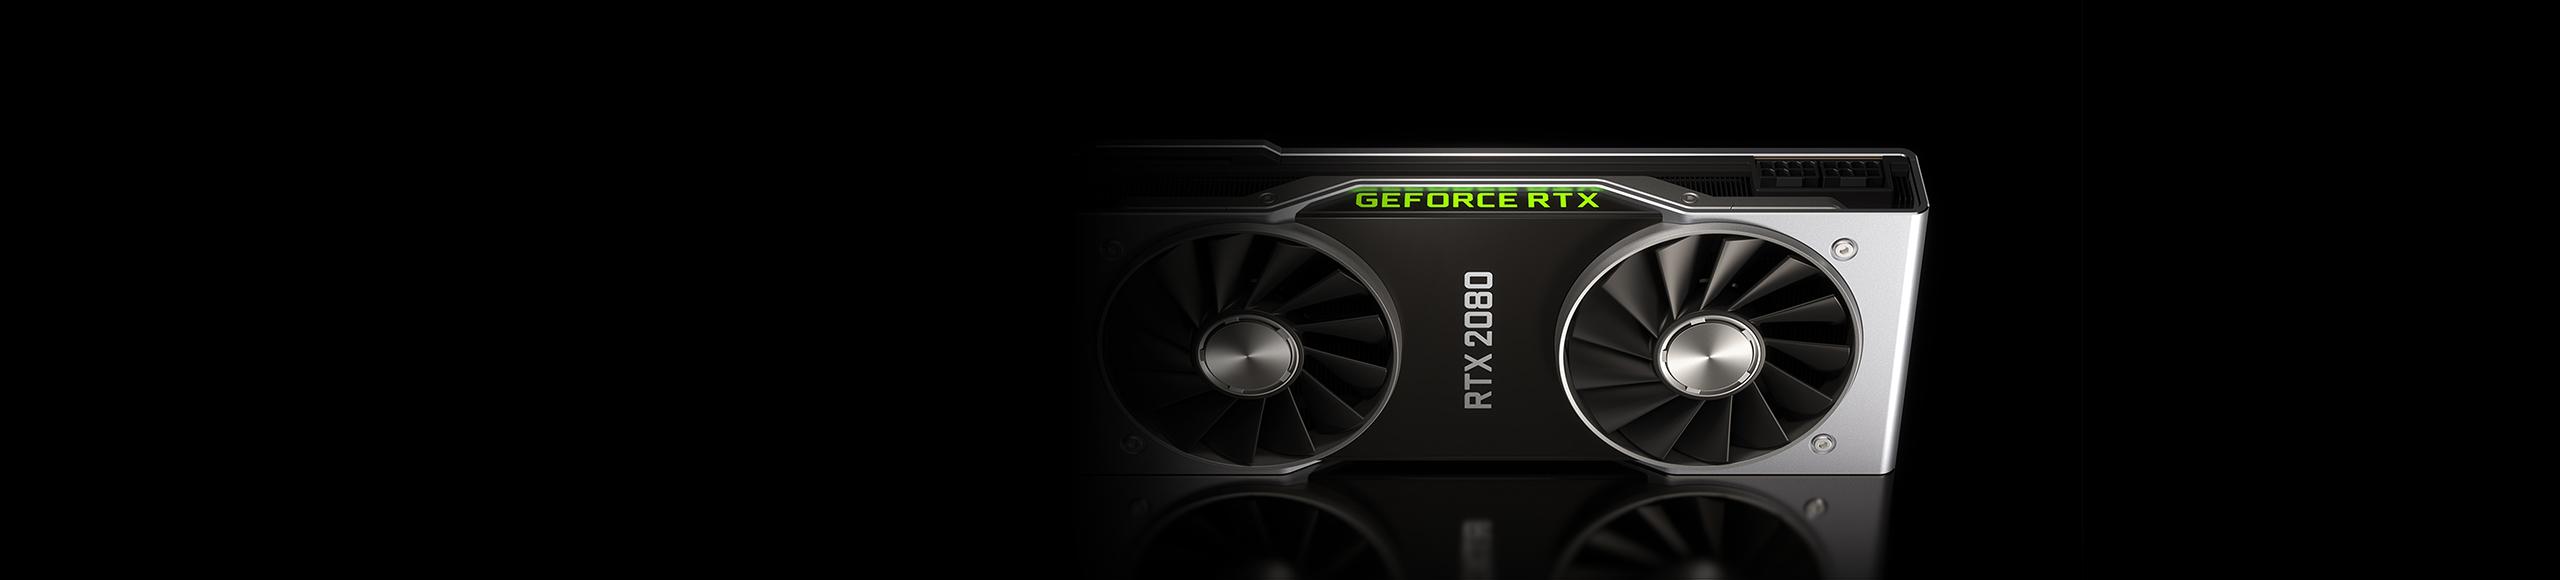 GeForce RTX 2080 Graphics Card | NVIDIA